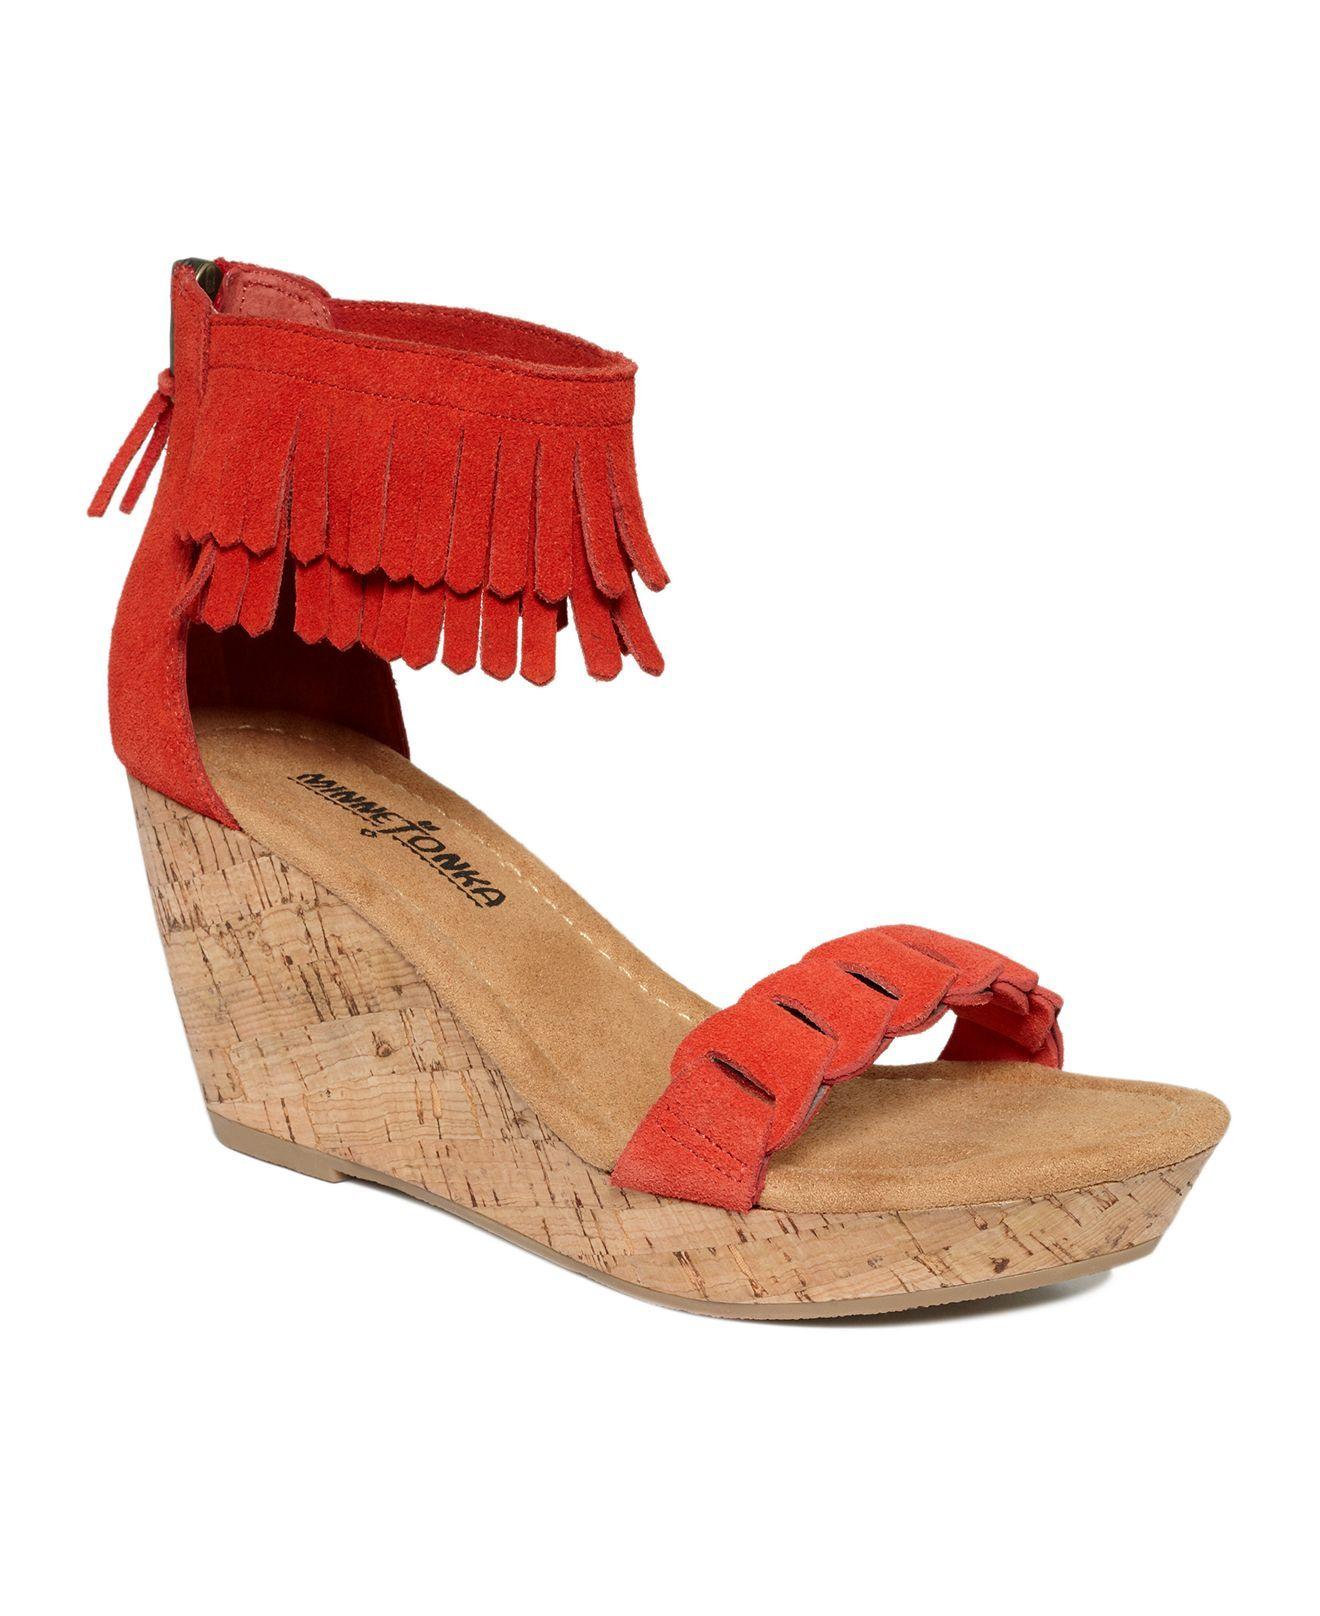 Minnetonka Poppy Wedge Sandal tCs3kDJpBR